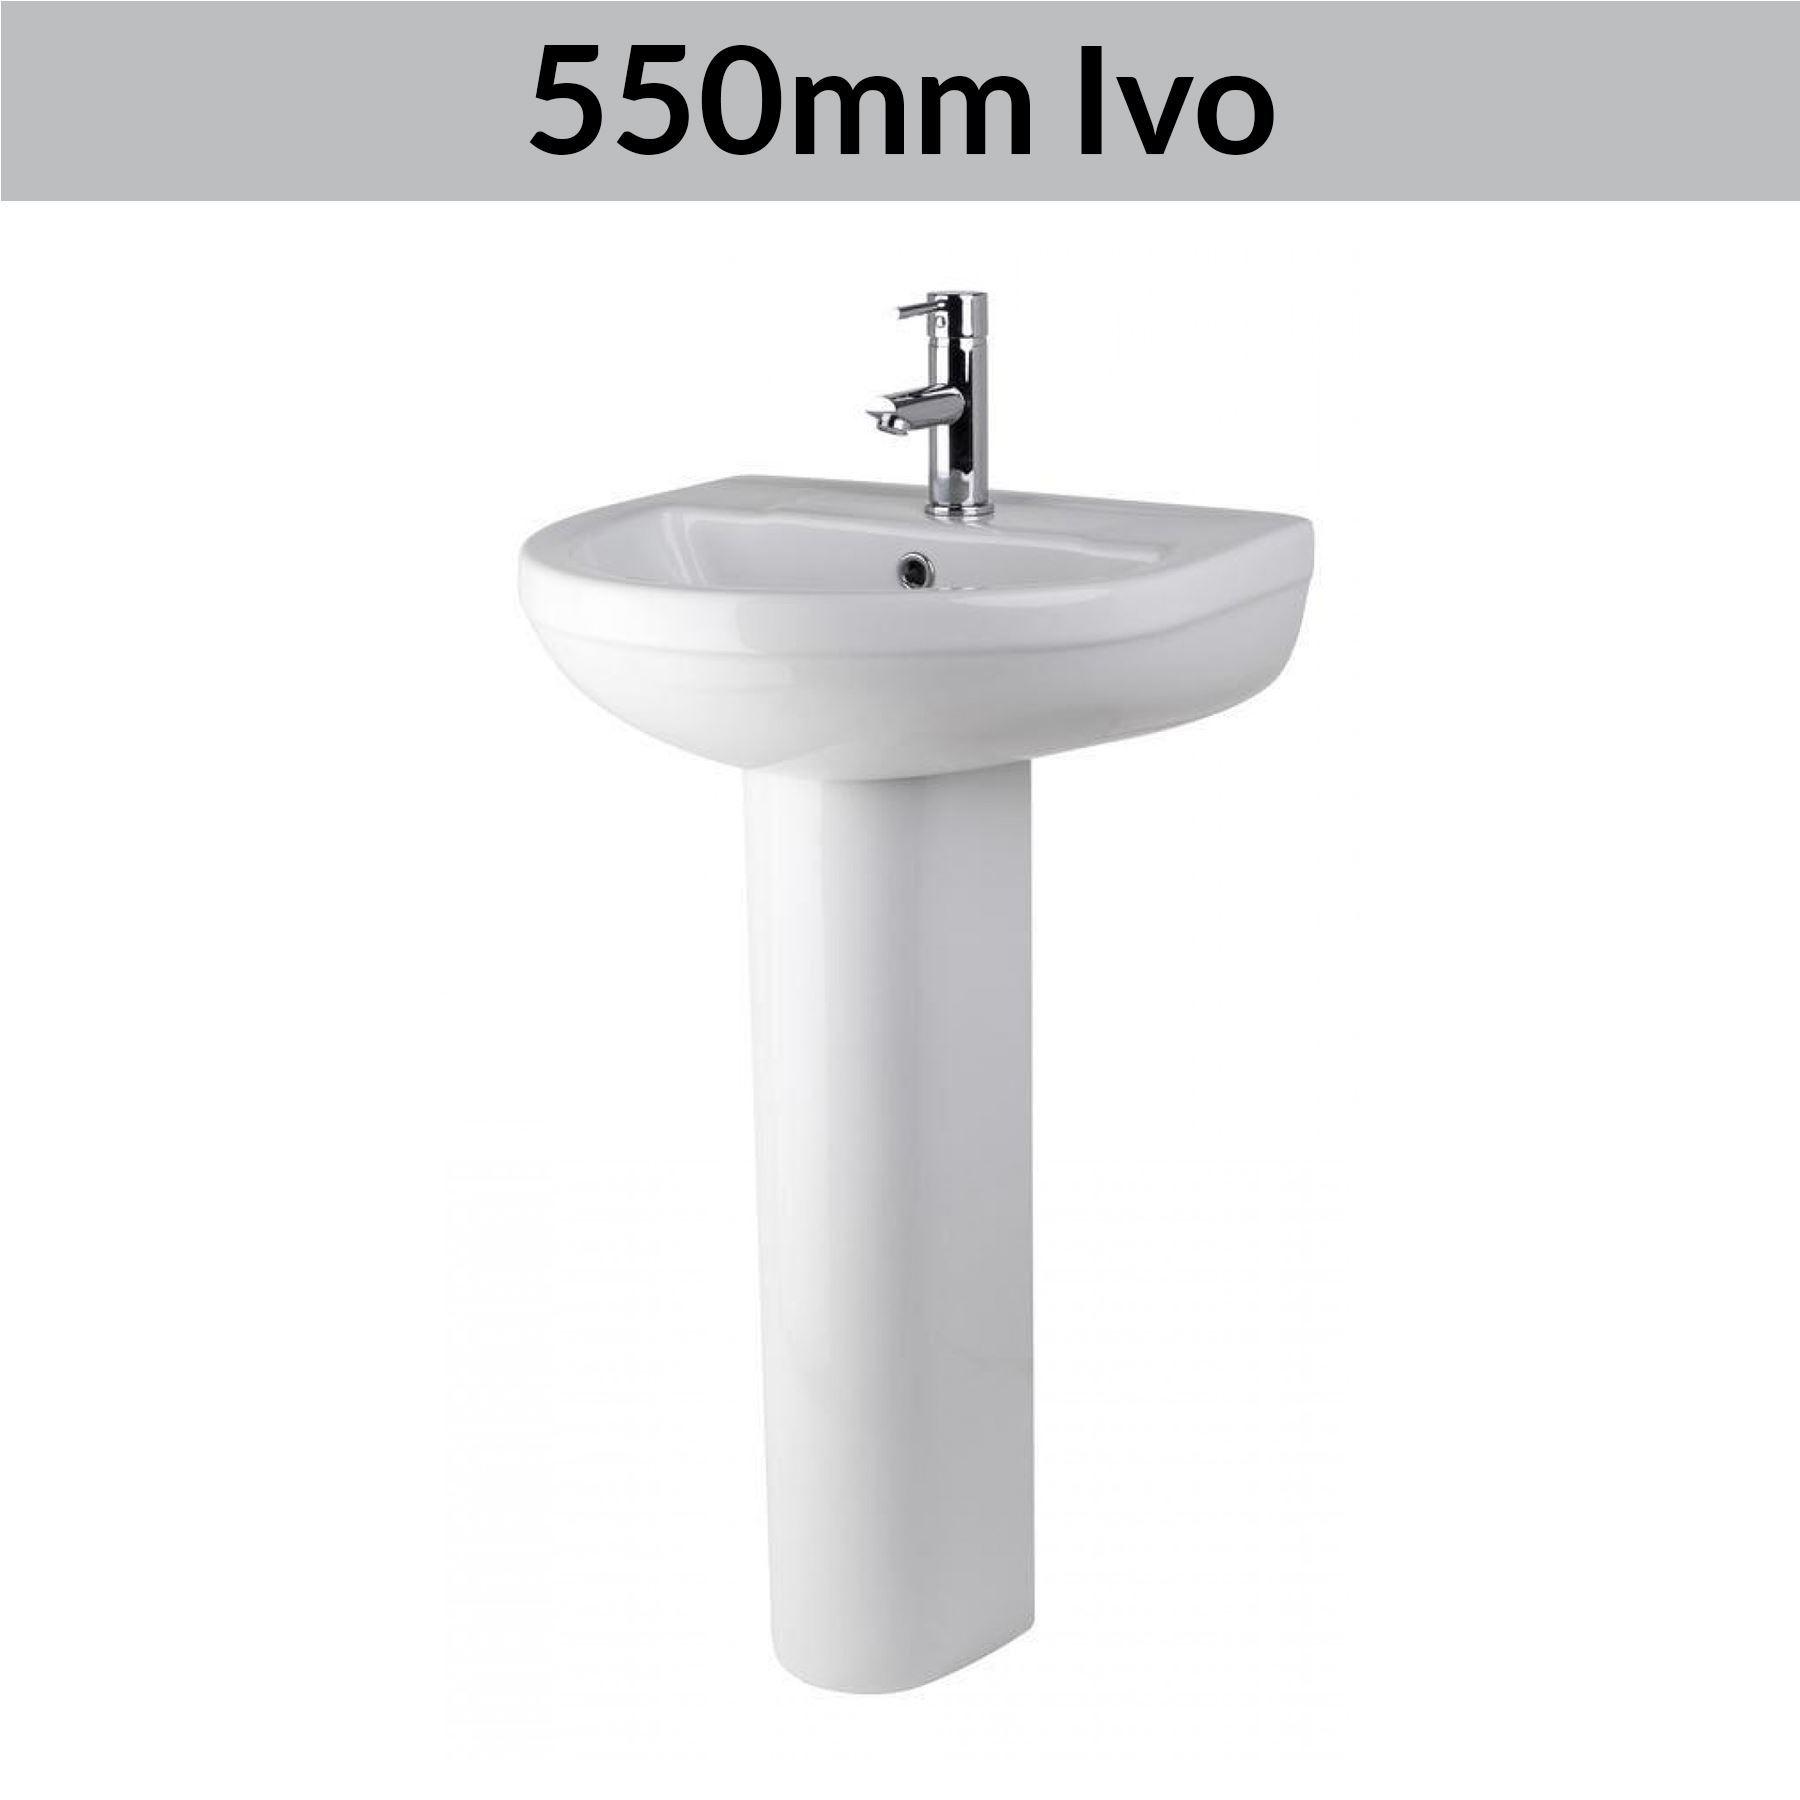 Modern Bathroom Basin Sinks Wash Full Pedestal Sink Ceramic Cloakroom Bowl White Ebay